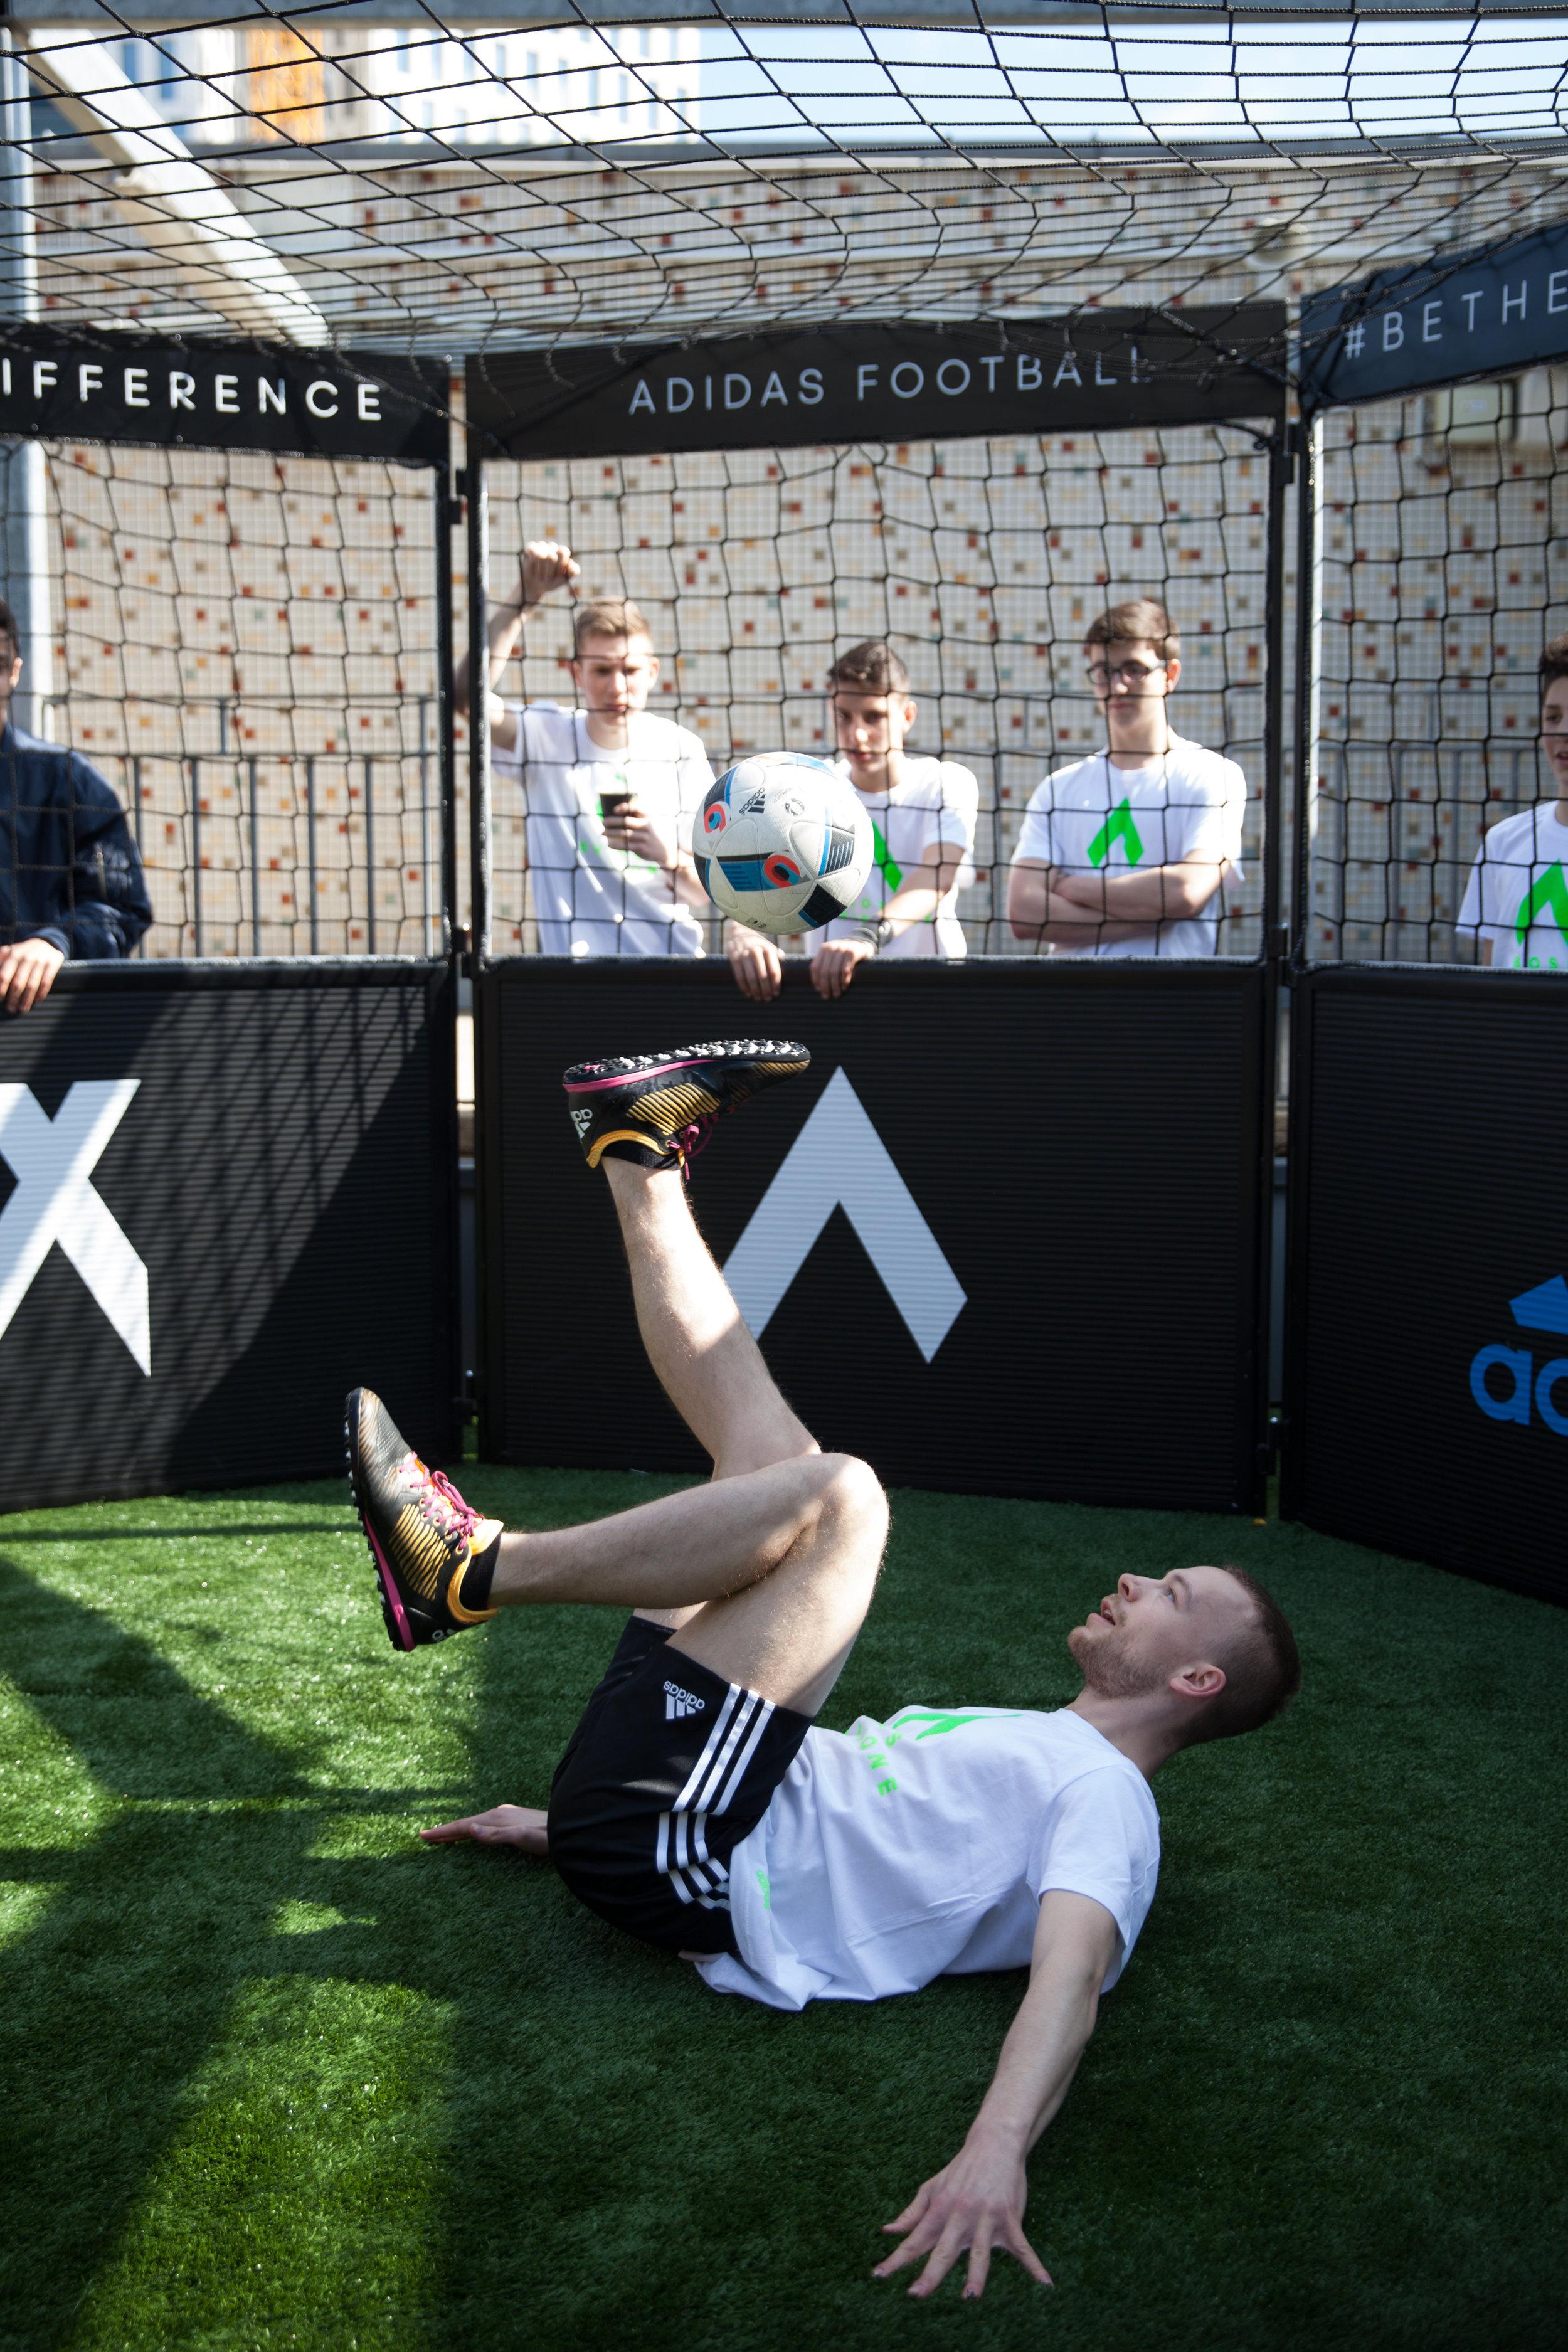 Karstadt Sports - Adidas - Solestall